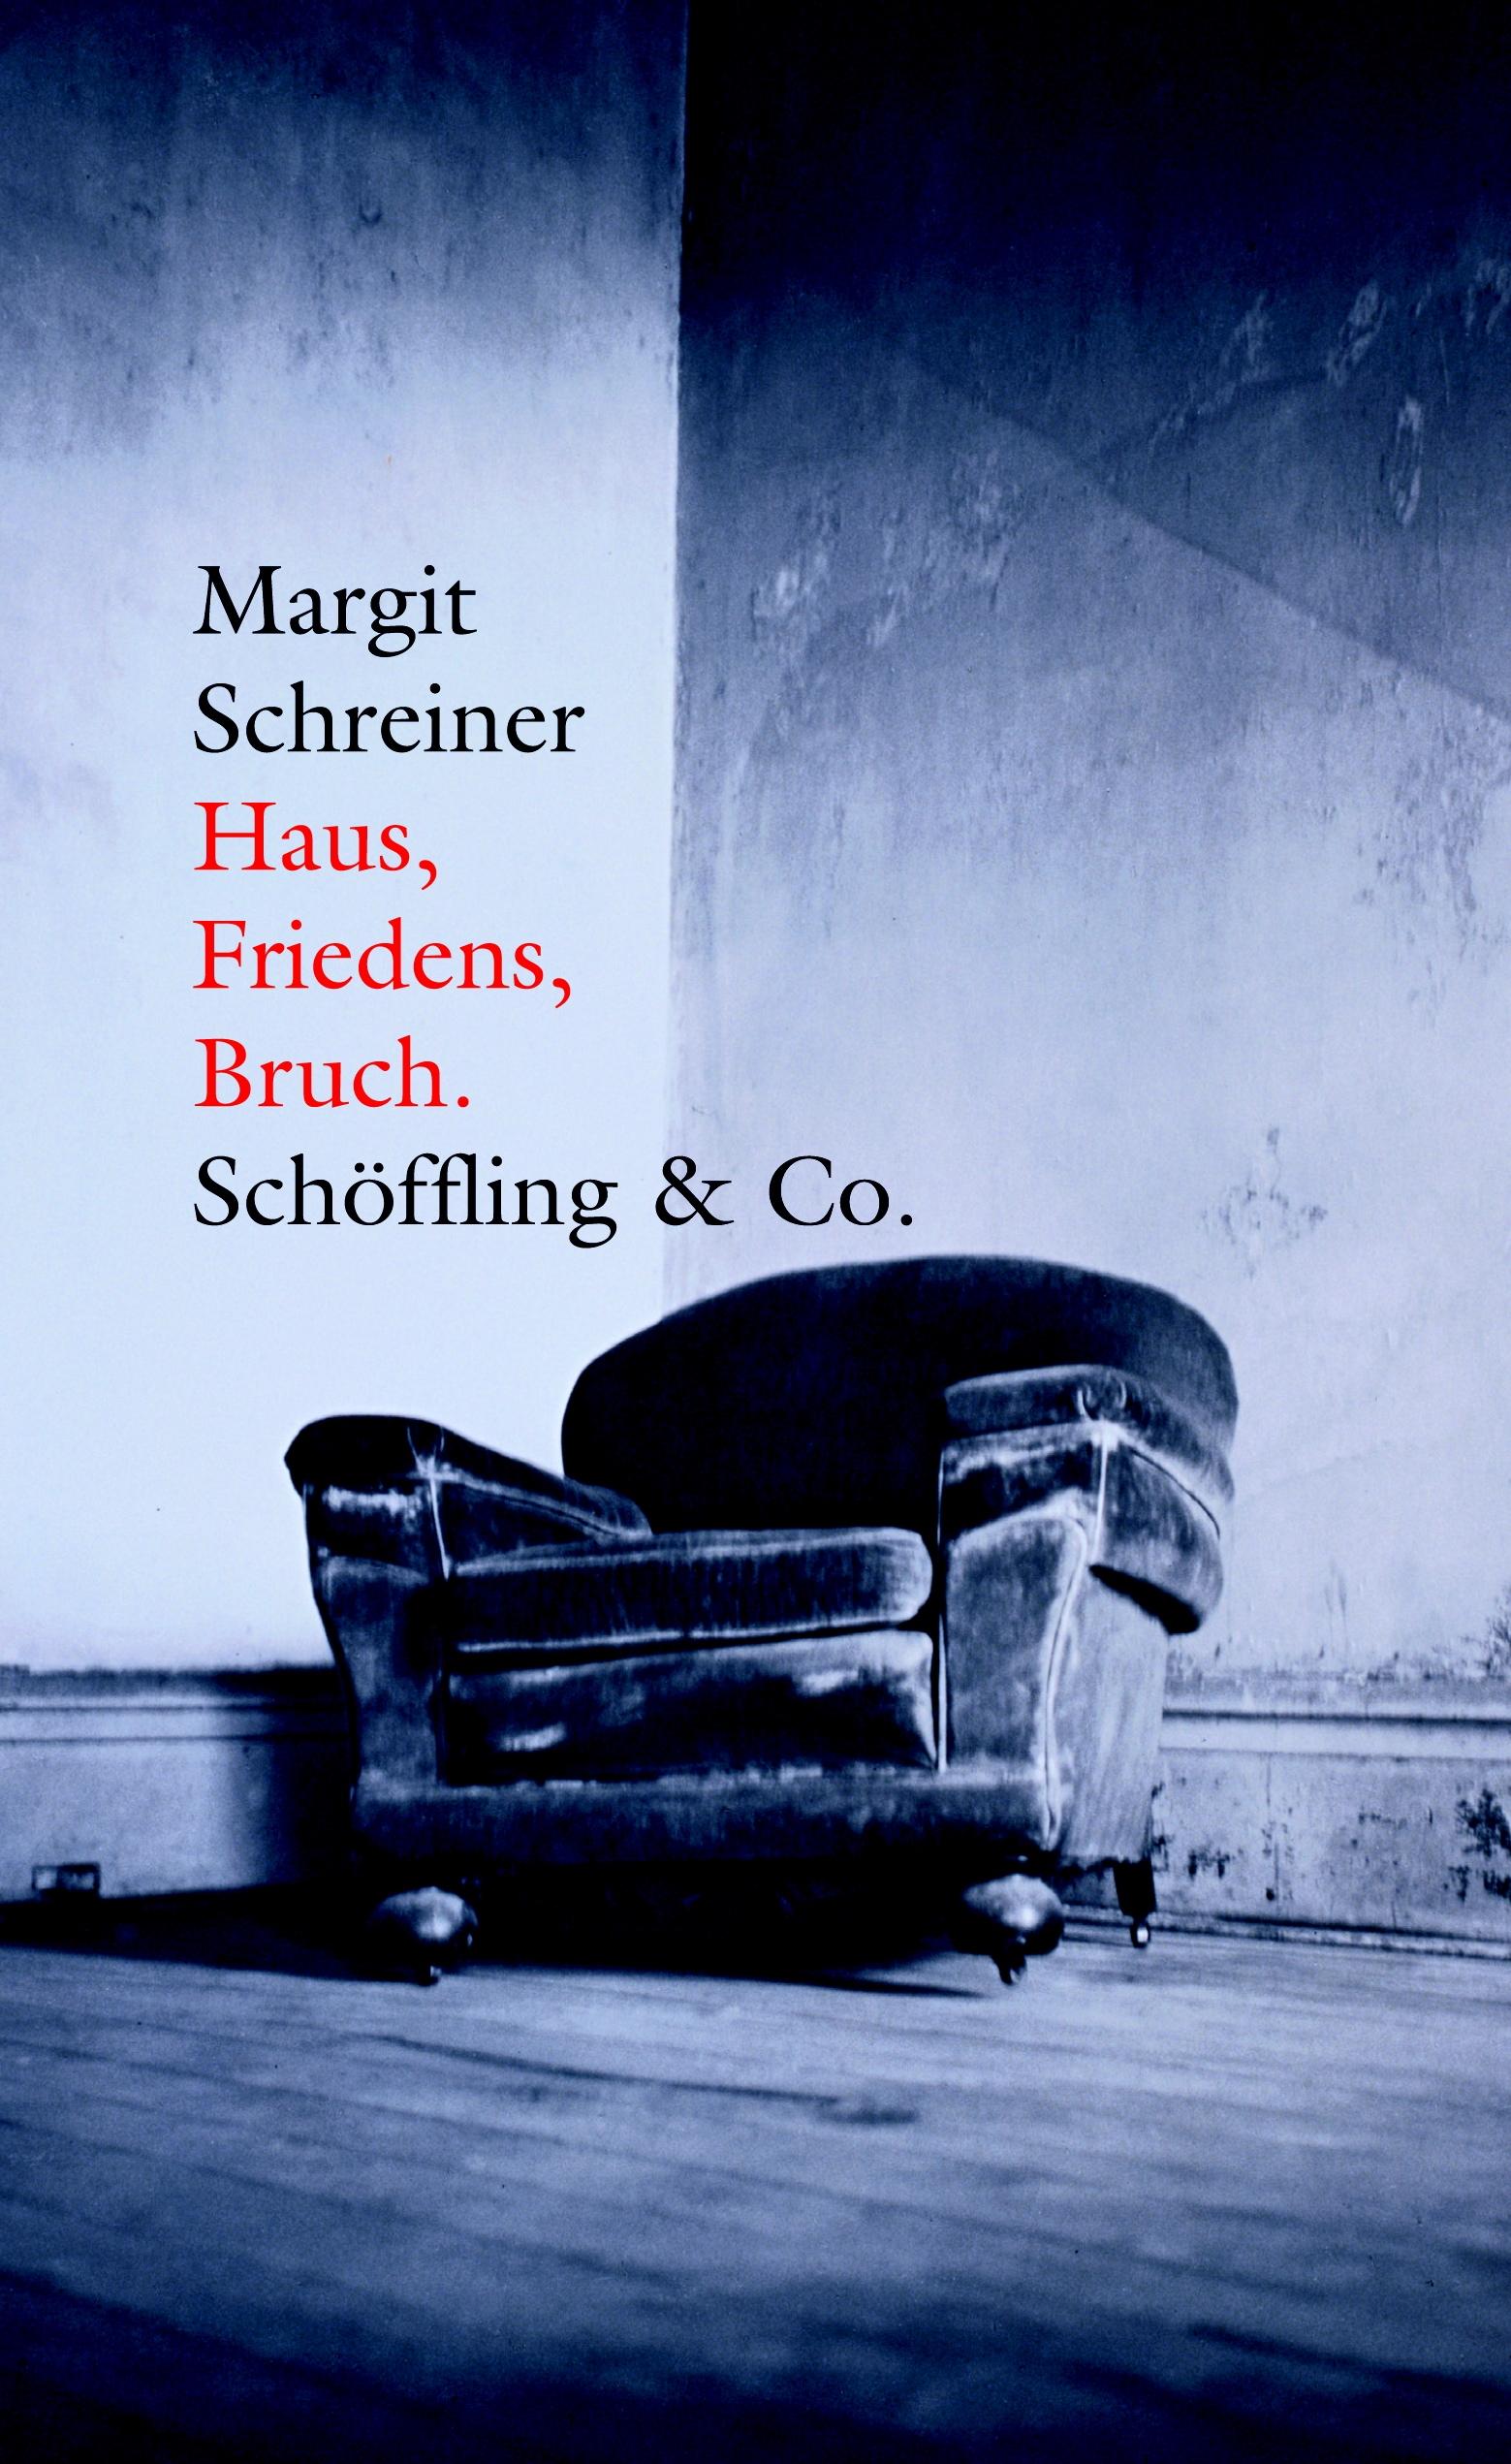 Margit Schreiner Haus, Friedens, Bruch. margit kaffka színek és évek